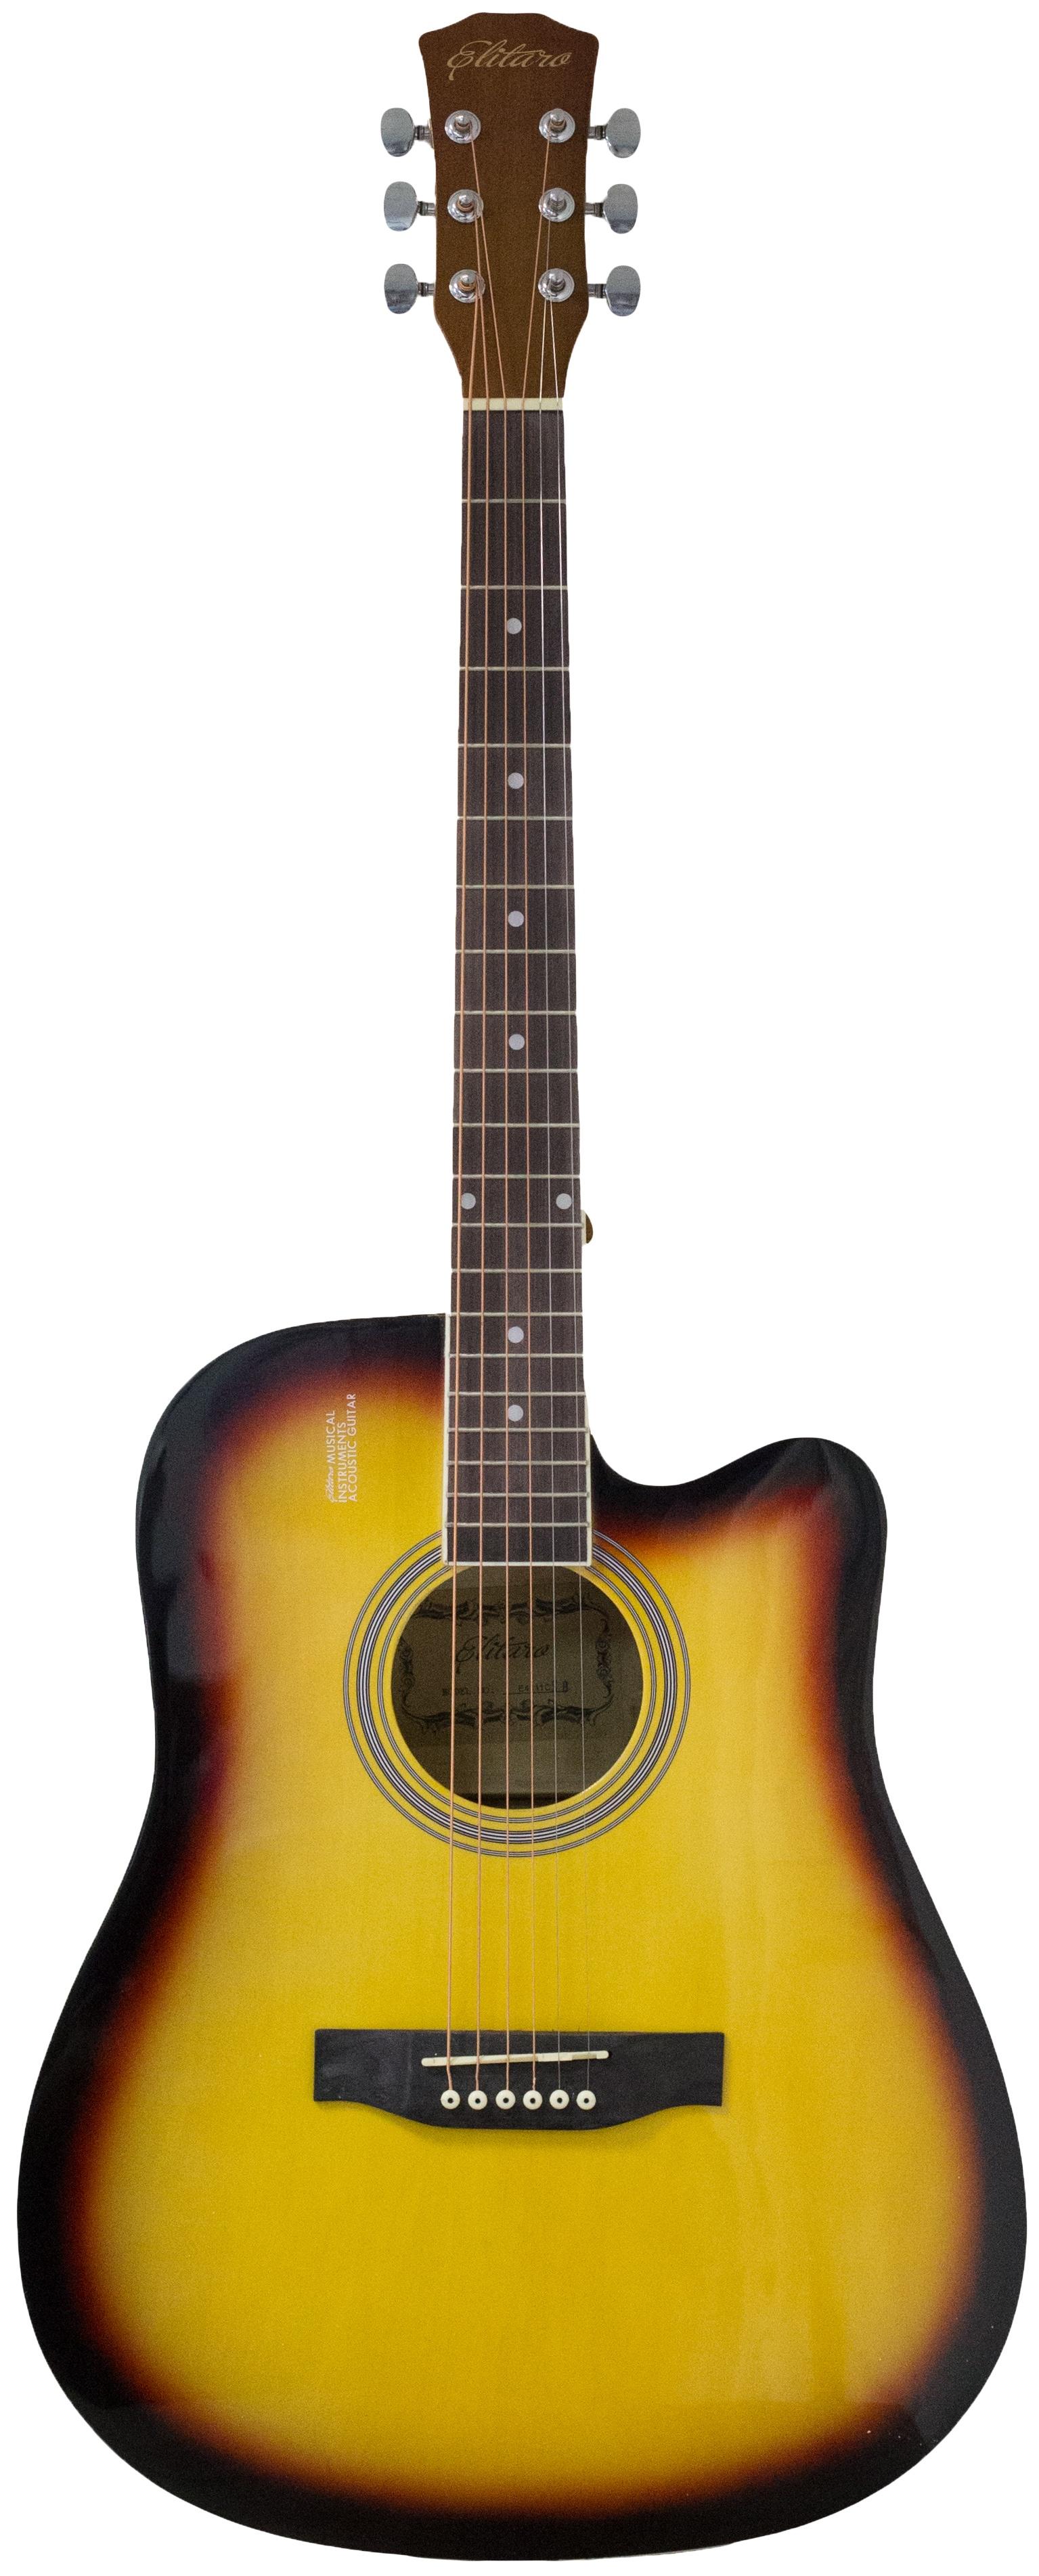 Elitaro-E4110C-Yellow-akusticheskaya-gitara-150945742